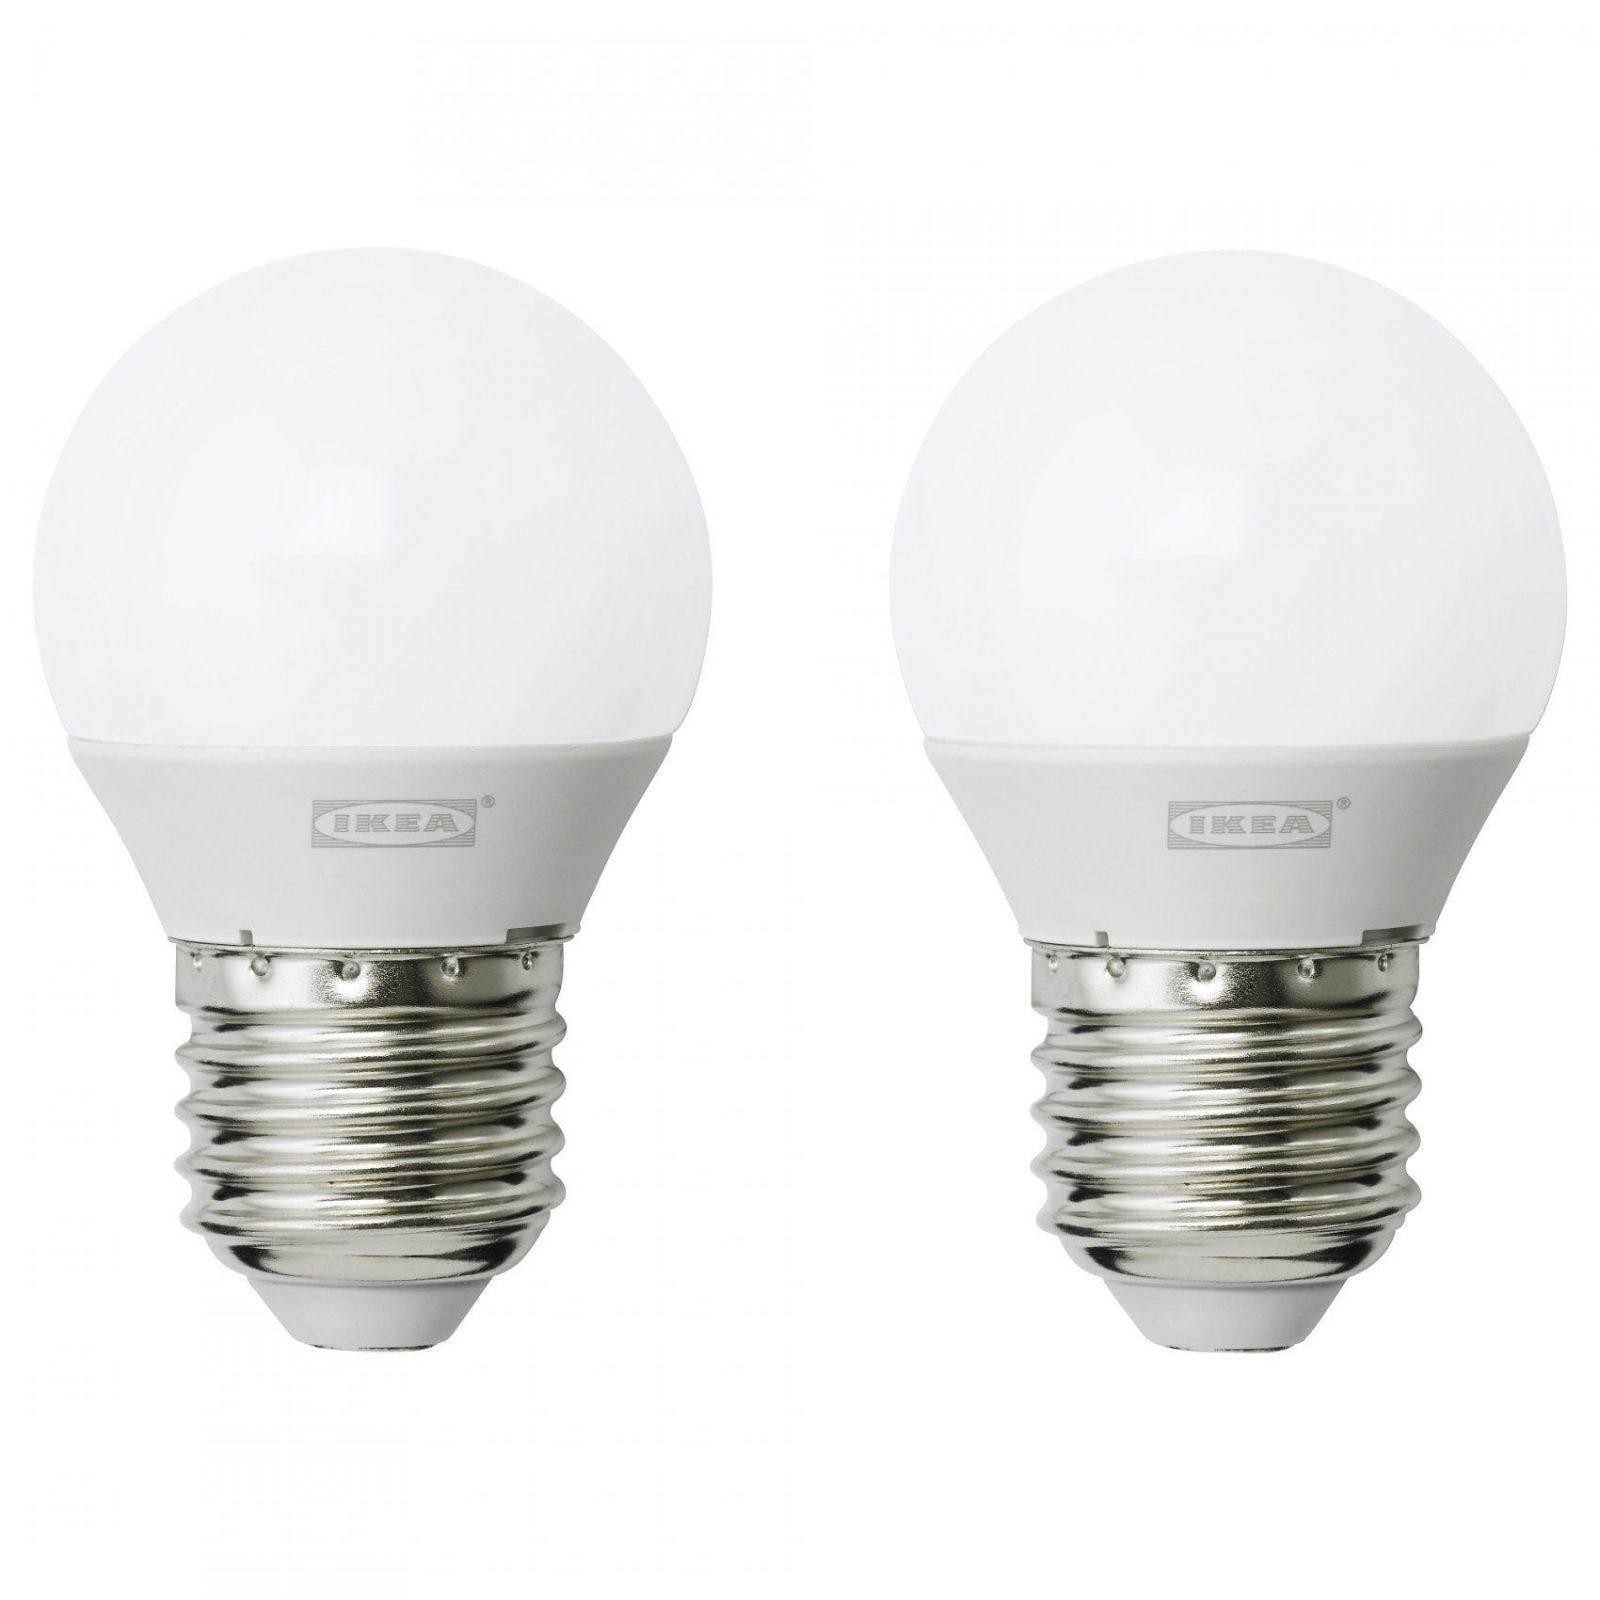 Verlichting & Lampen  Ikea von Ikea Led Lampen Dimmbar Bild